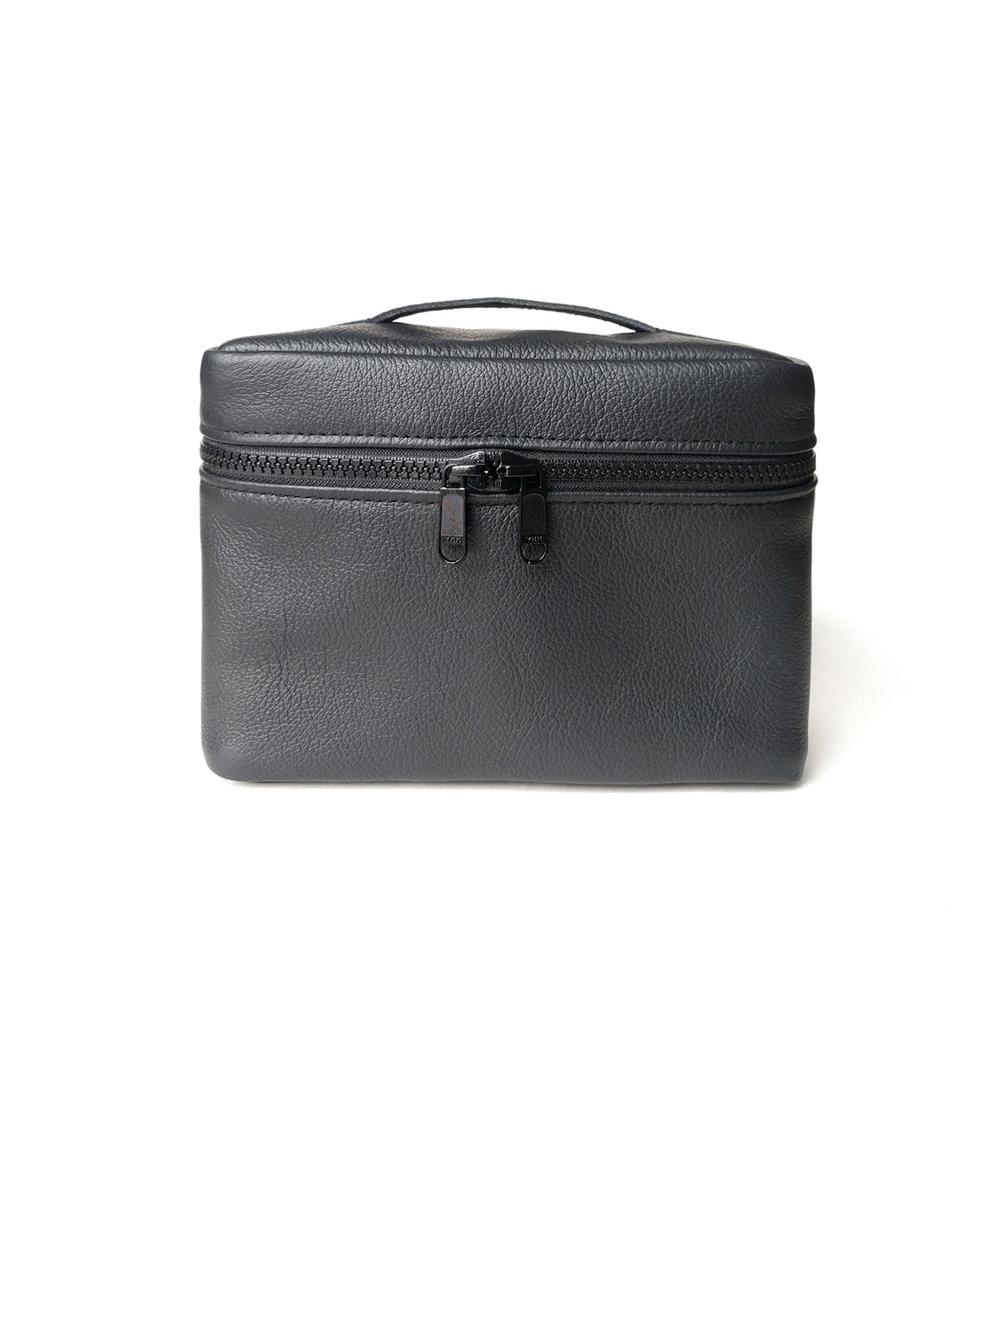 Box - Leather dopp kit - 90.00$